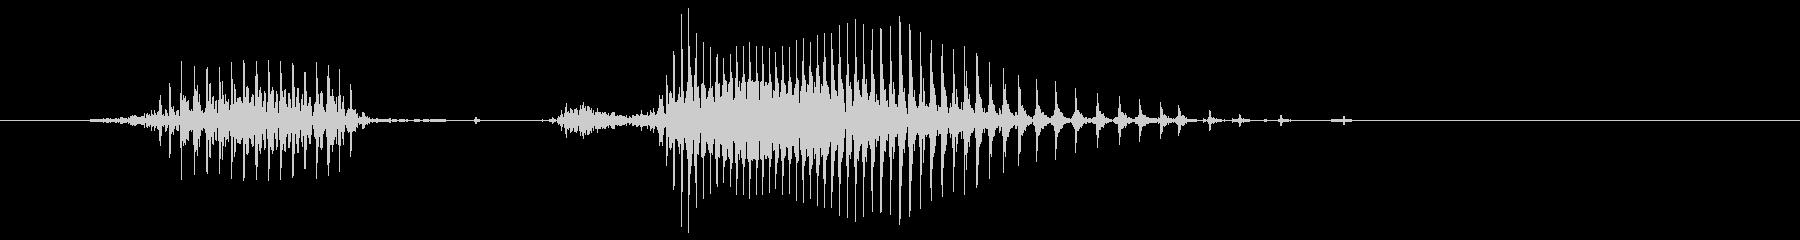 Top 10の未再生の波形